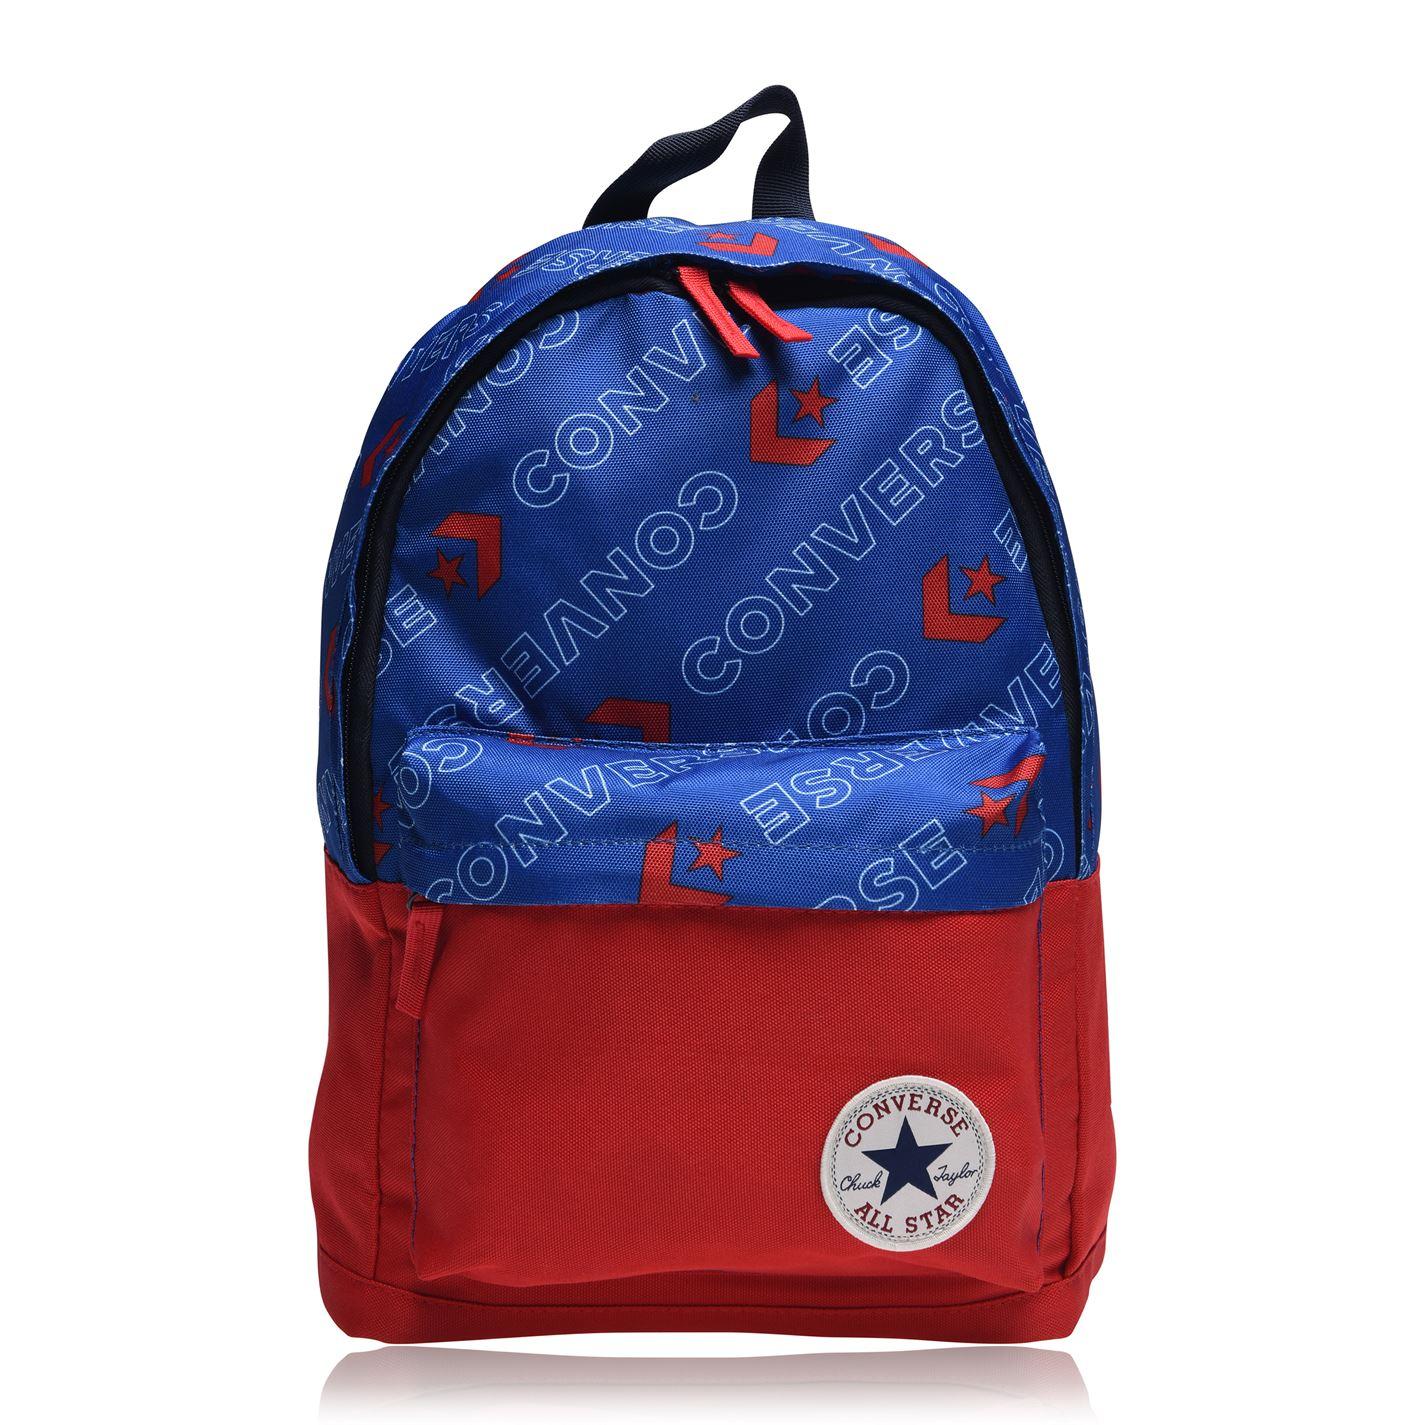 Converse Chuck Taylor Backpack